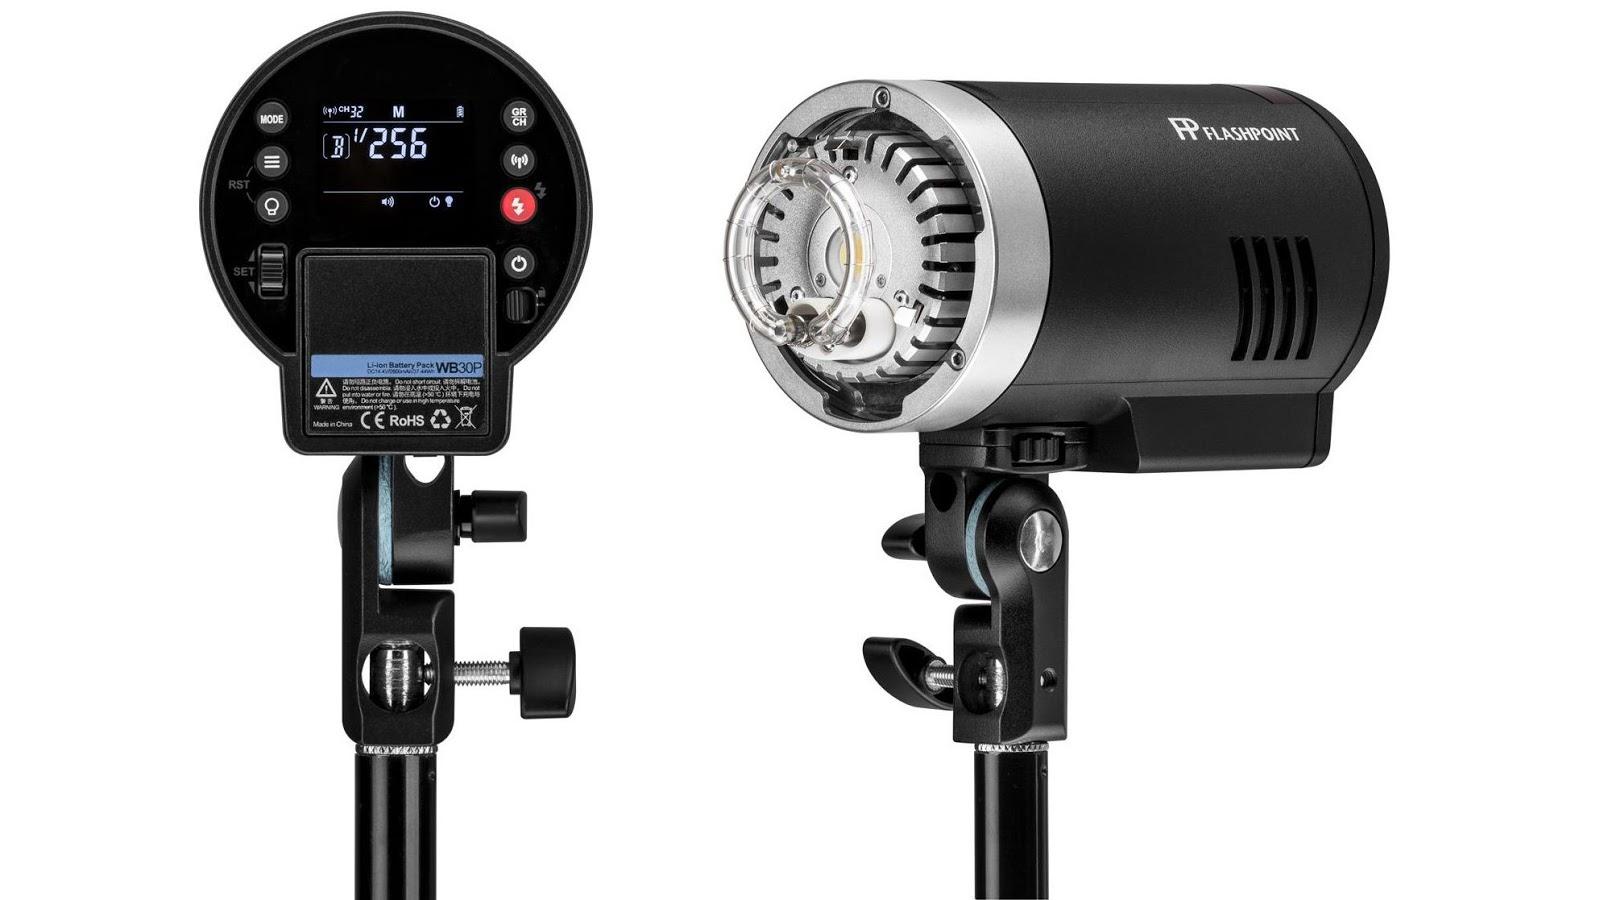 Flashpoint Xplor 300 Pro TTL